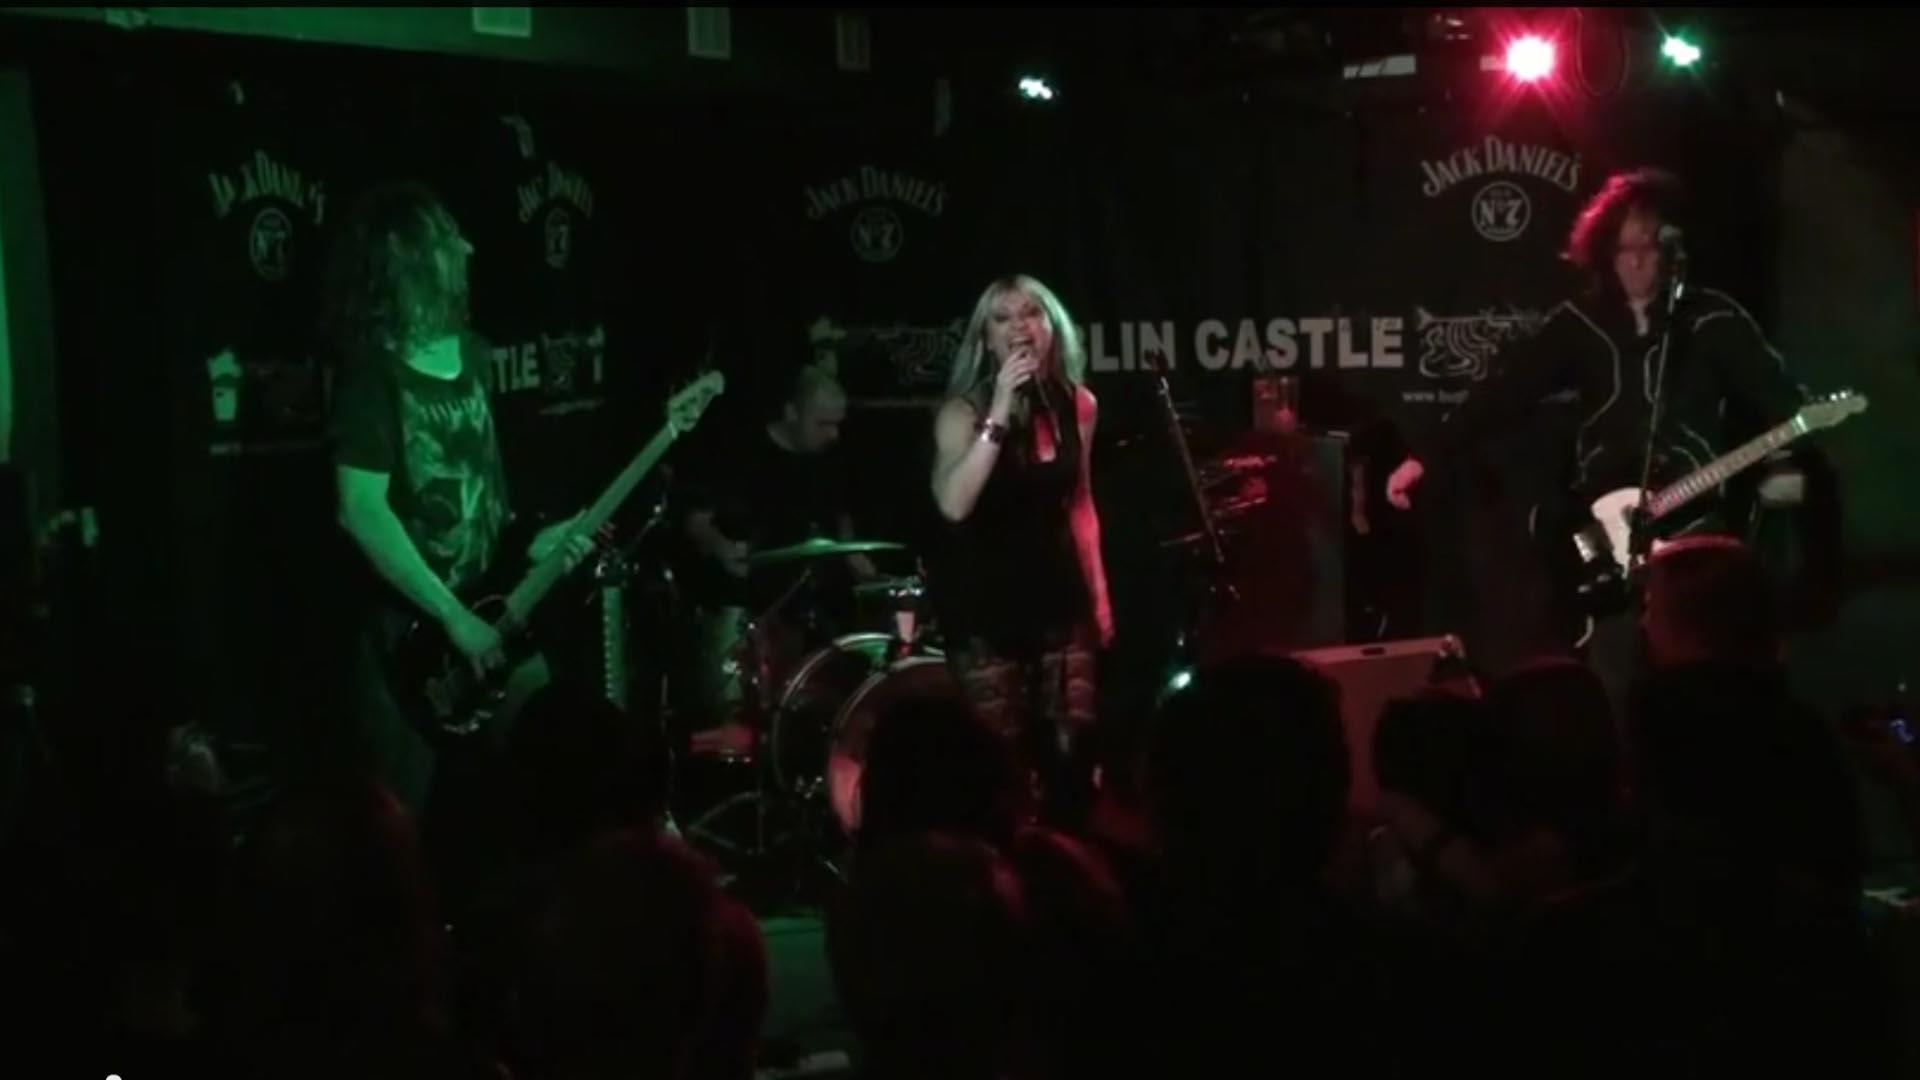 GRACE_SOLERO_-_We_Don_t_Wanna__live_at_the_Dublin_Castle__London